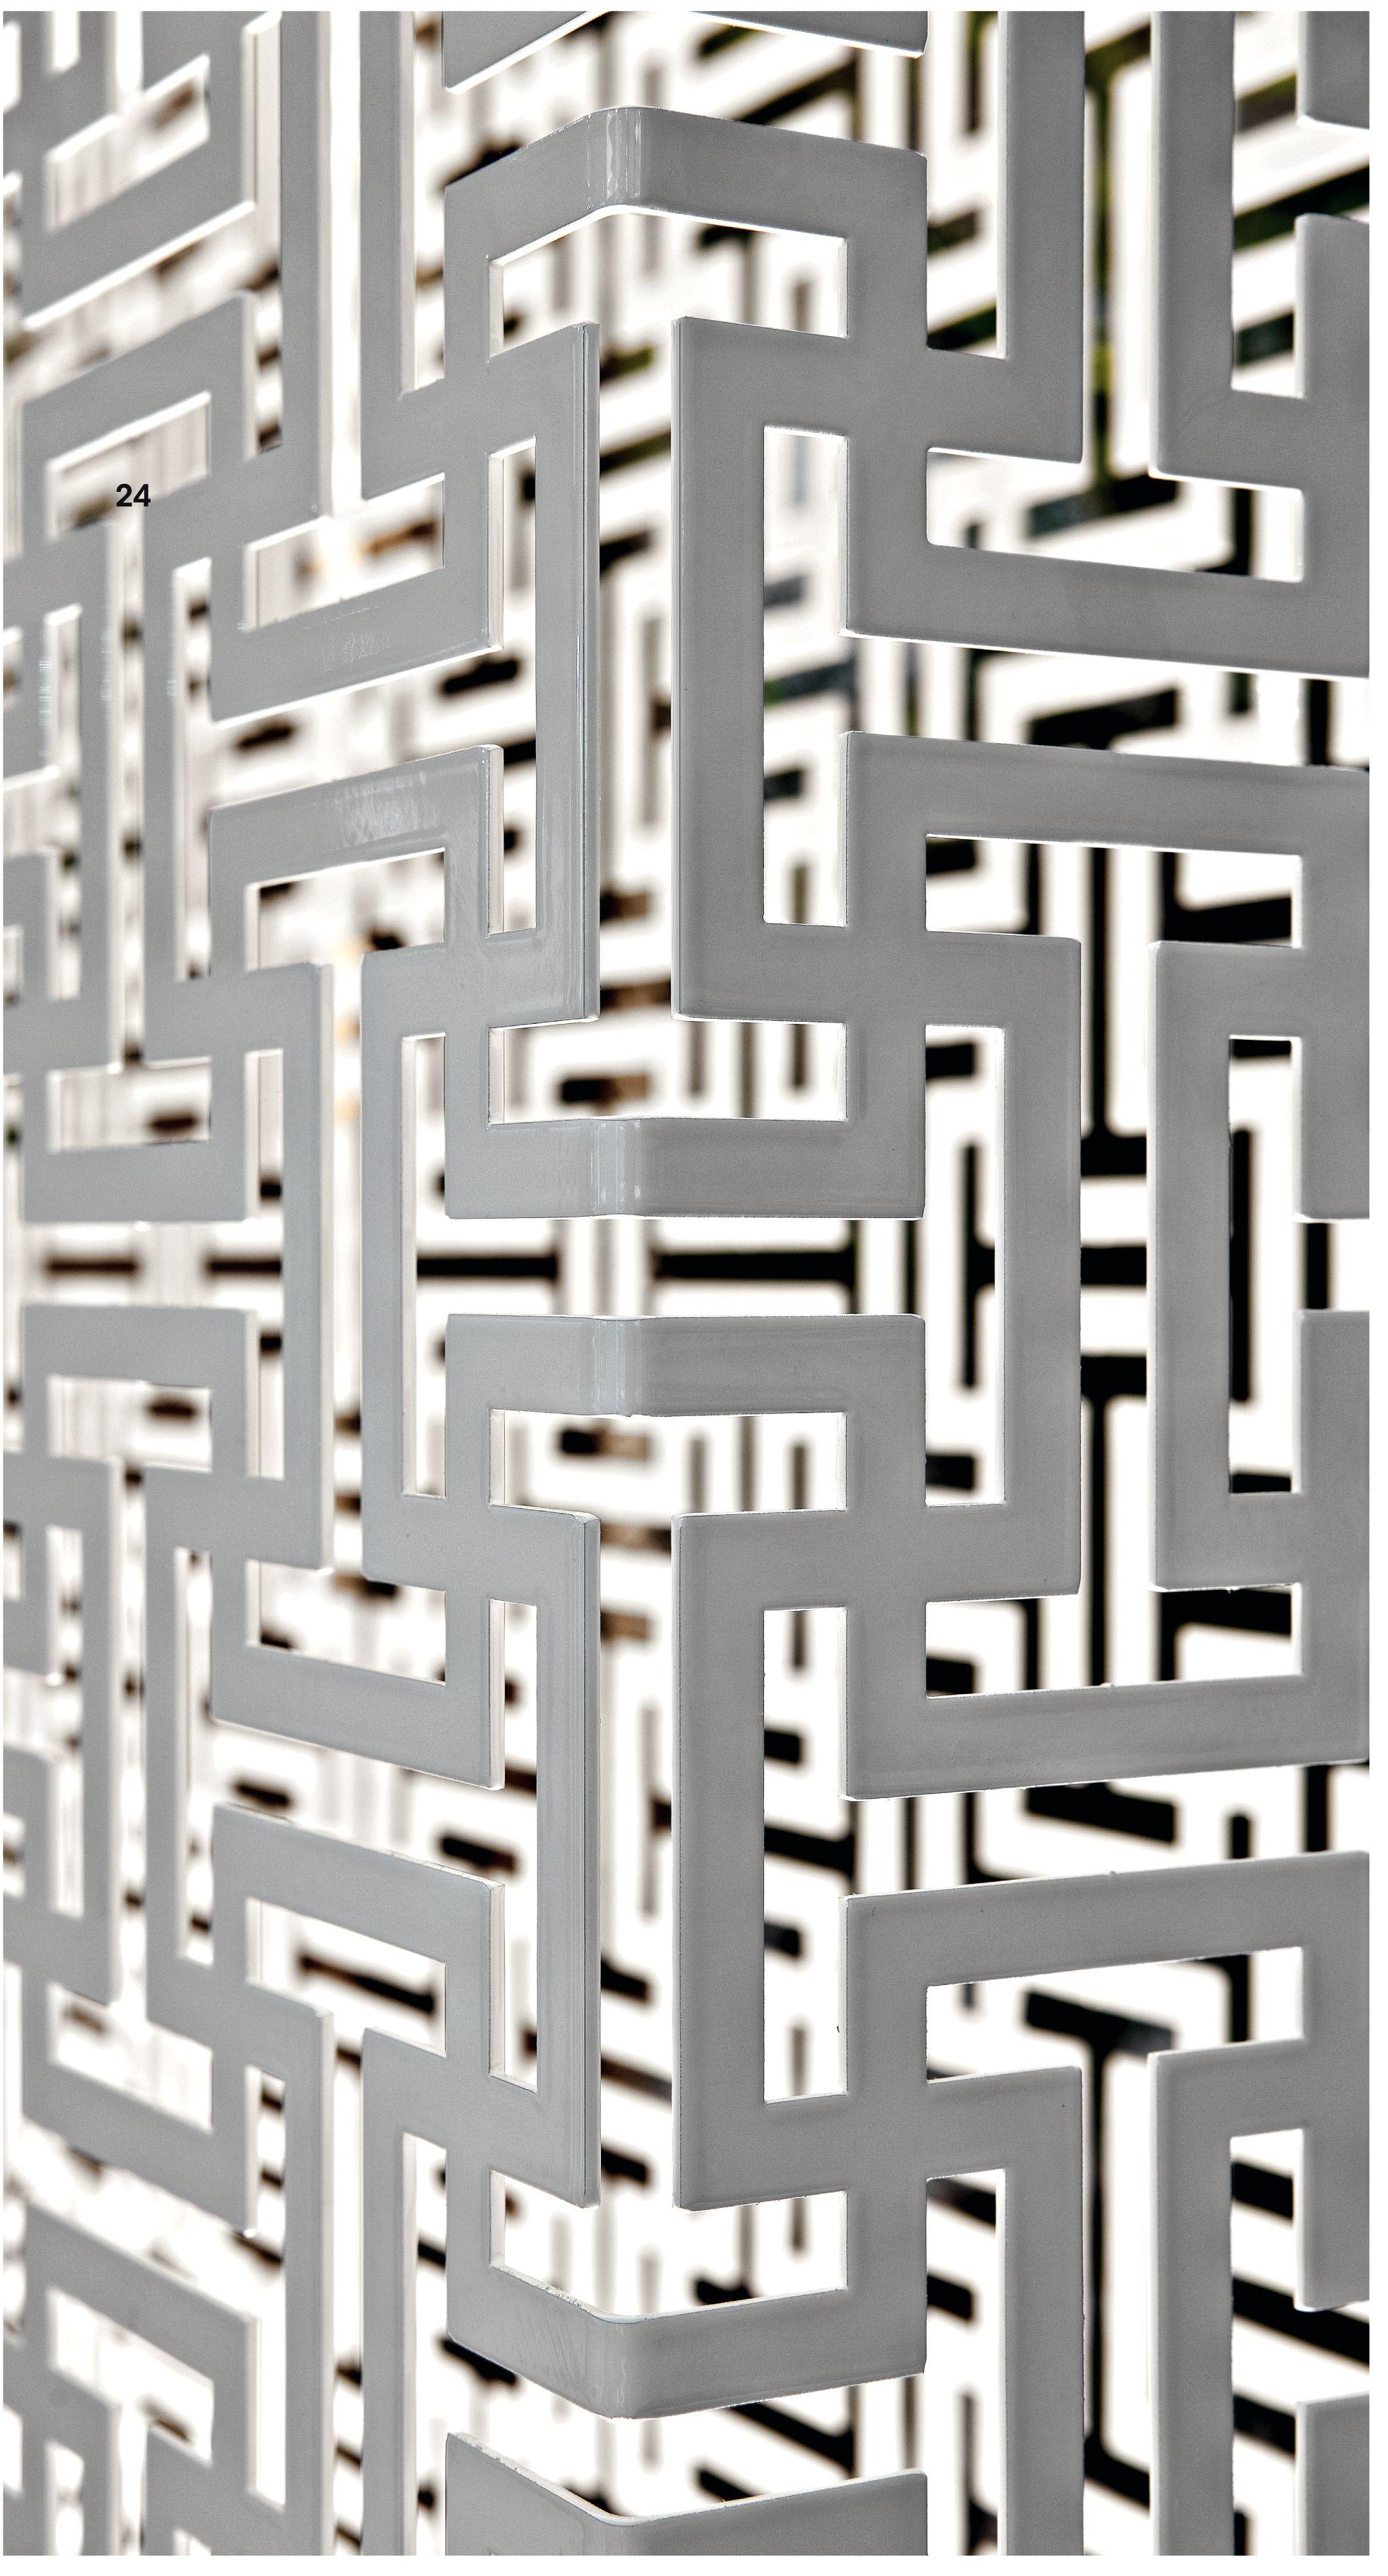 Demetra decastellithe prime lattice work pinterest screens 3d tiles demetra dailygadgetfo Gallery